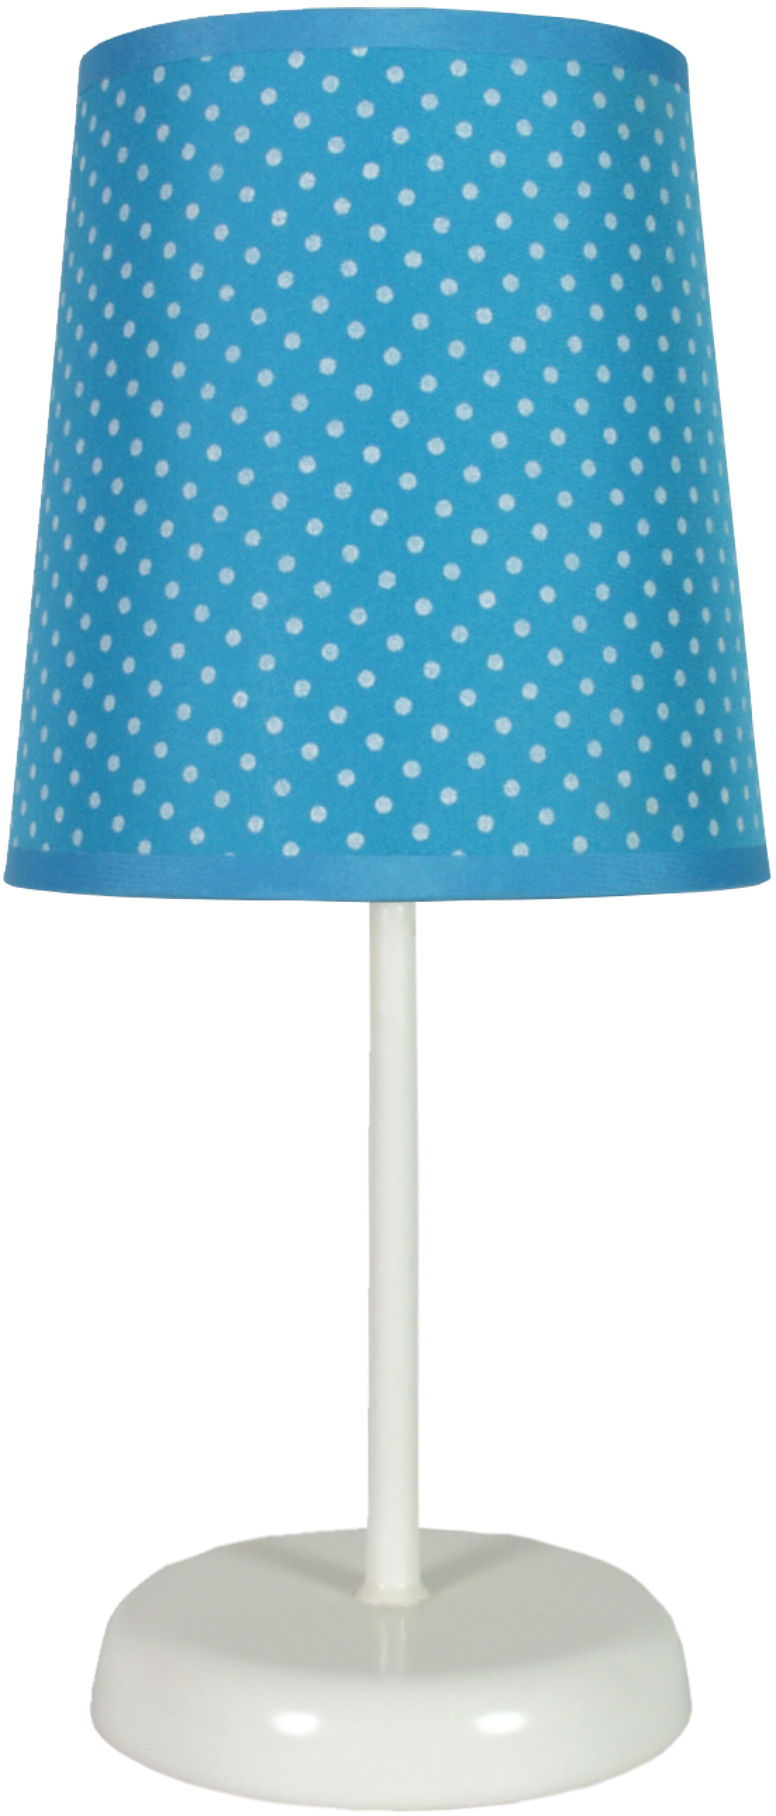 Candellux GALA 41-98293 lampa stołowa abażur niebieska w kropki 1X40W E14 14 cm